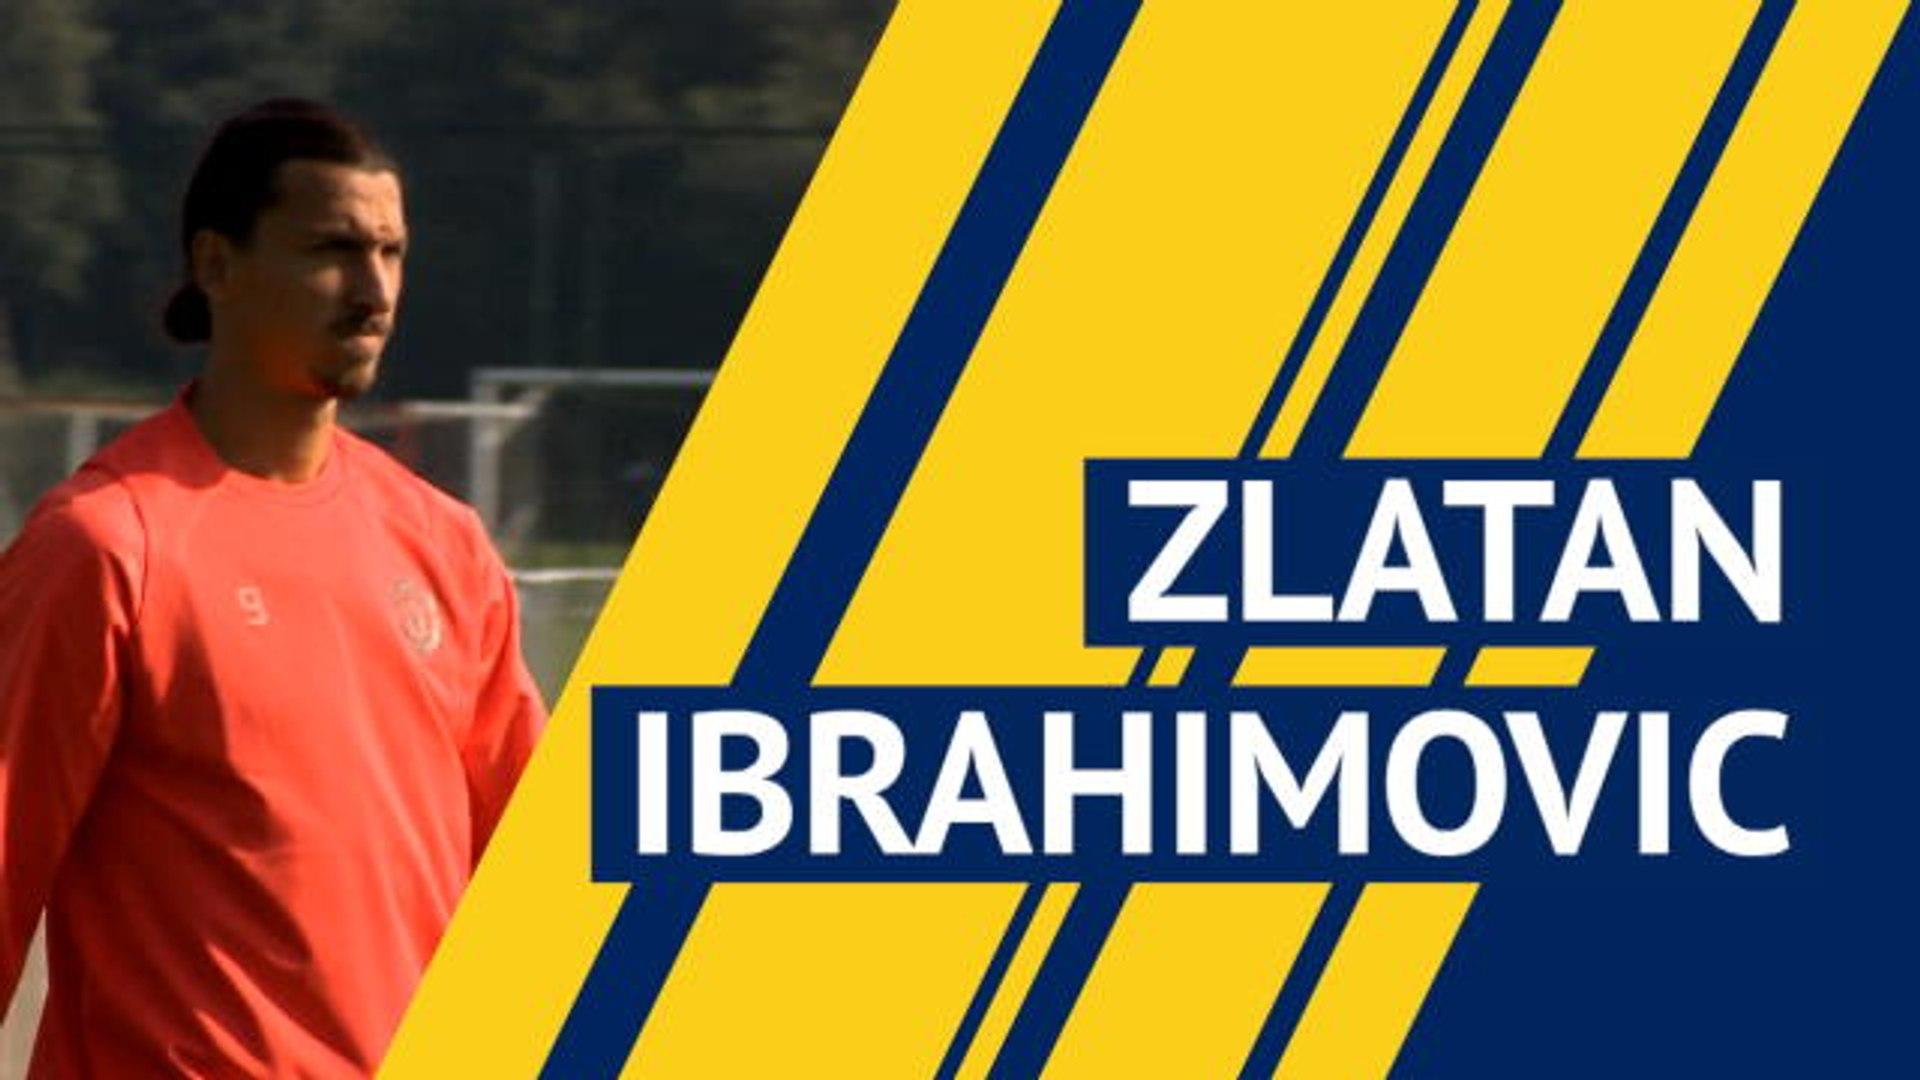 MLS - Zlatan Ibrahimovic, l'homme aux 500 buts